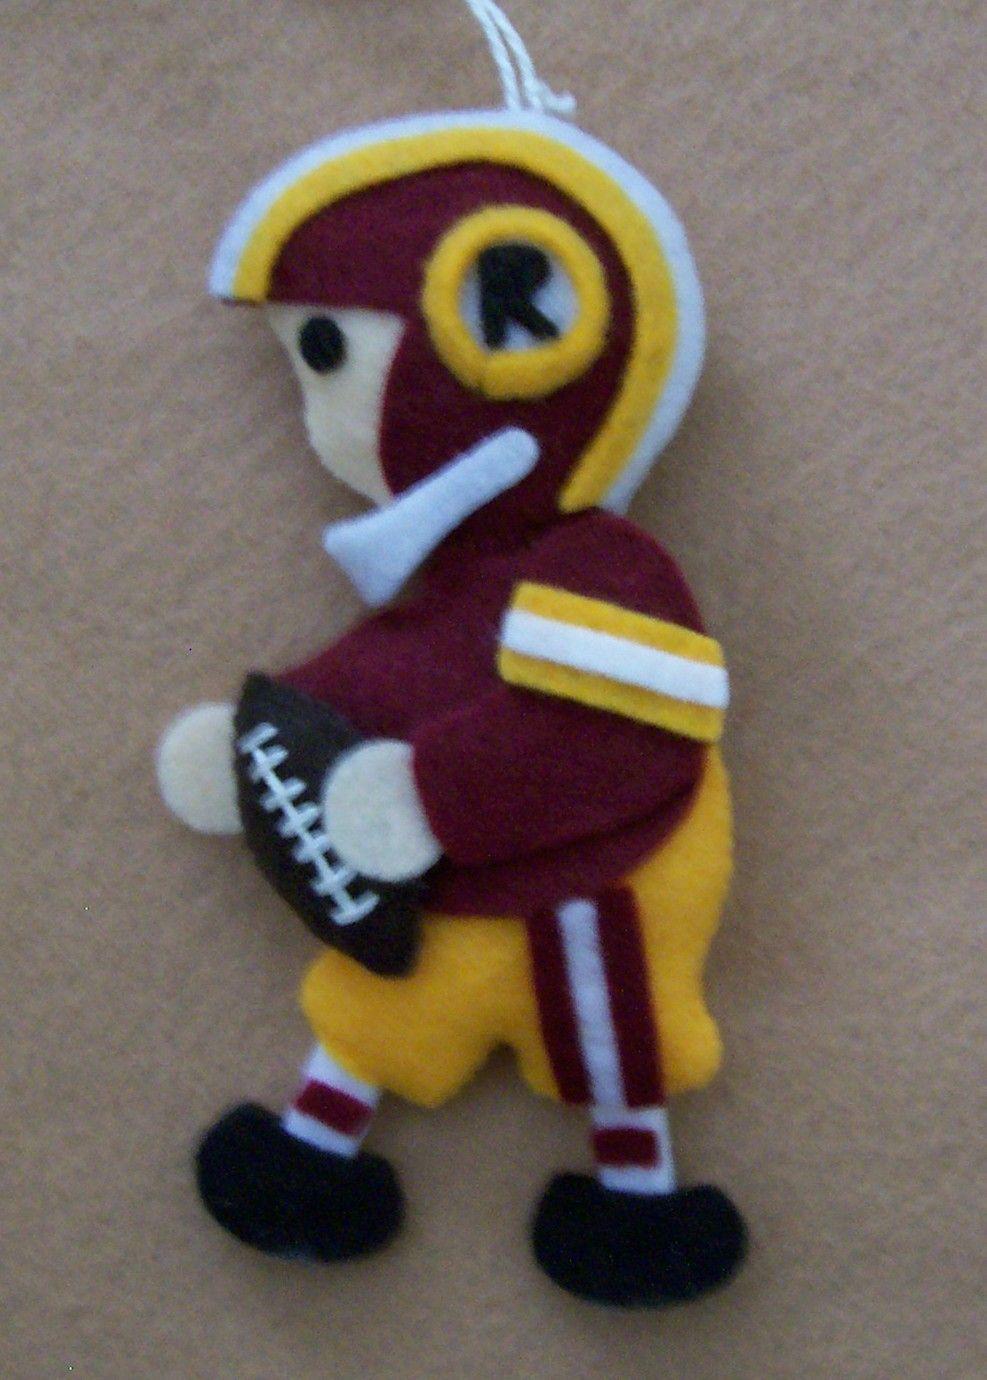 Football player ornament - Fans Of Carolyn Deangelis Felt Ornaments Clif Football Player